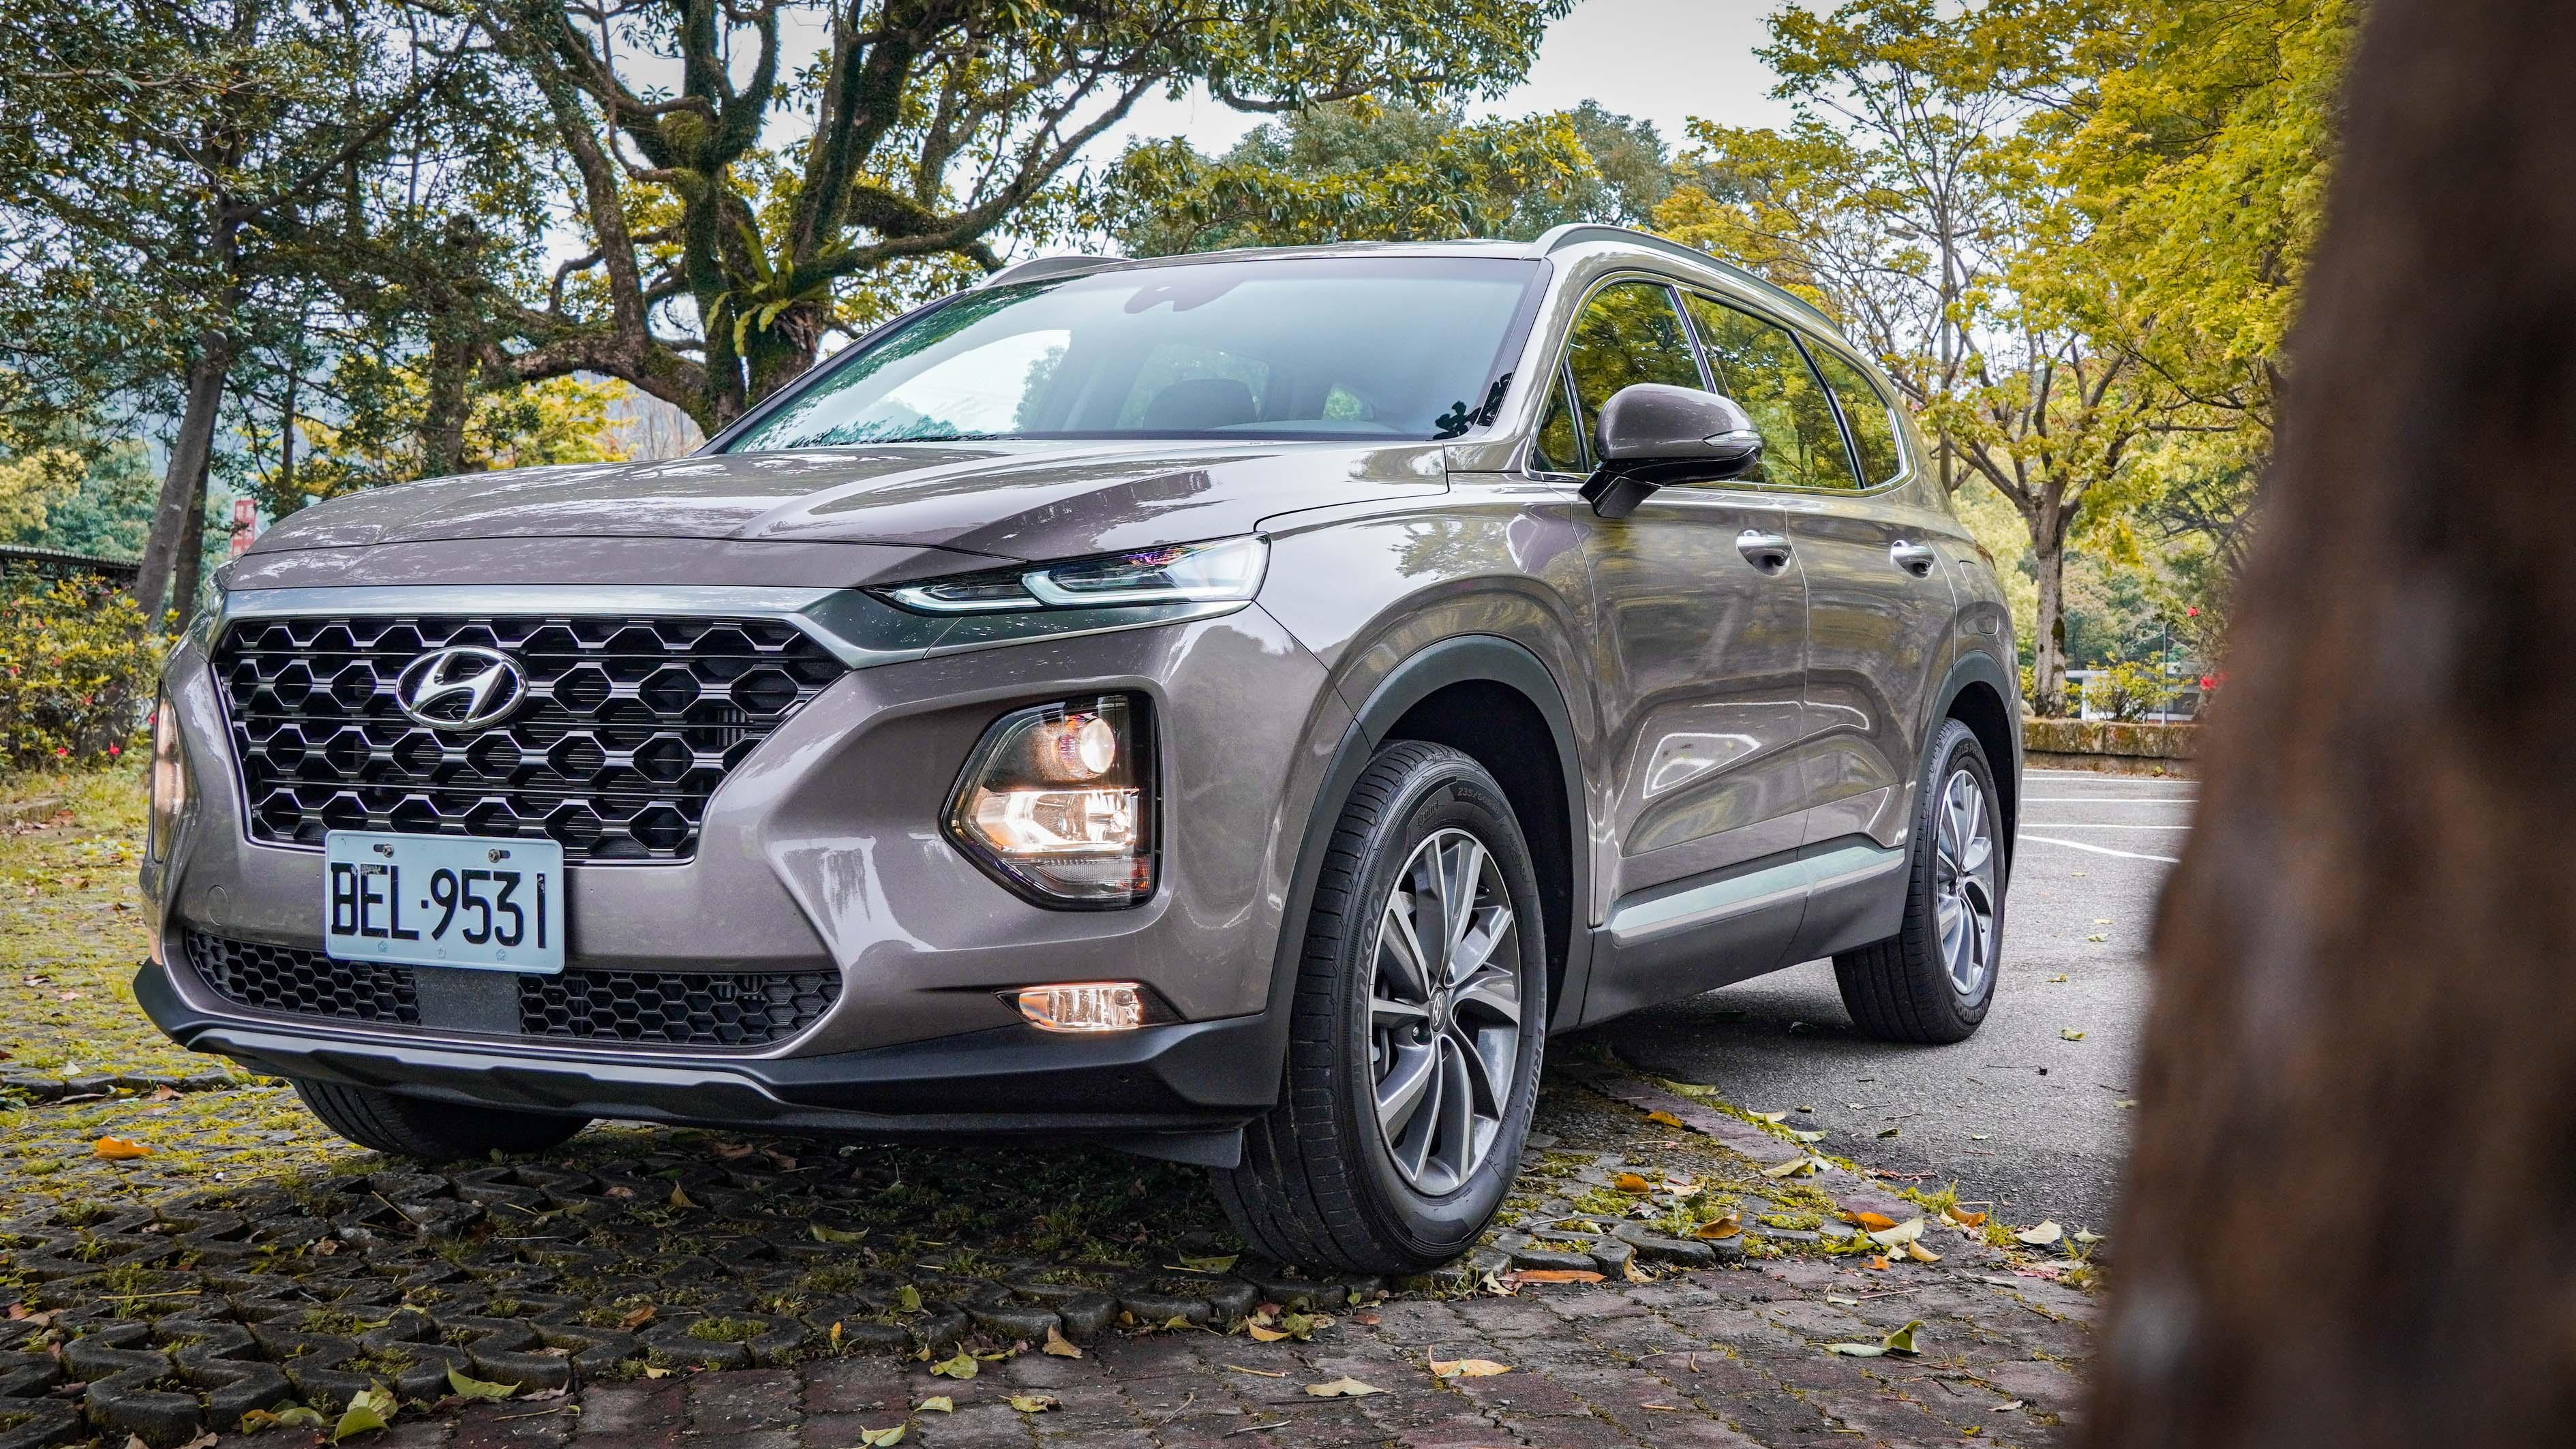 Hyundai Santa Fe 以三車型販售:2.4 汽油 4WD 尊爵(129.9 萬)、2.4 汽油旗艦(139.9 萬)、2.2 柴油 4WD 旗艦(149.9 萬)